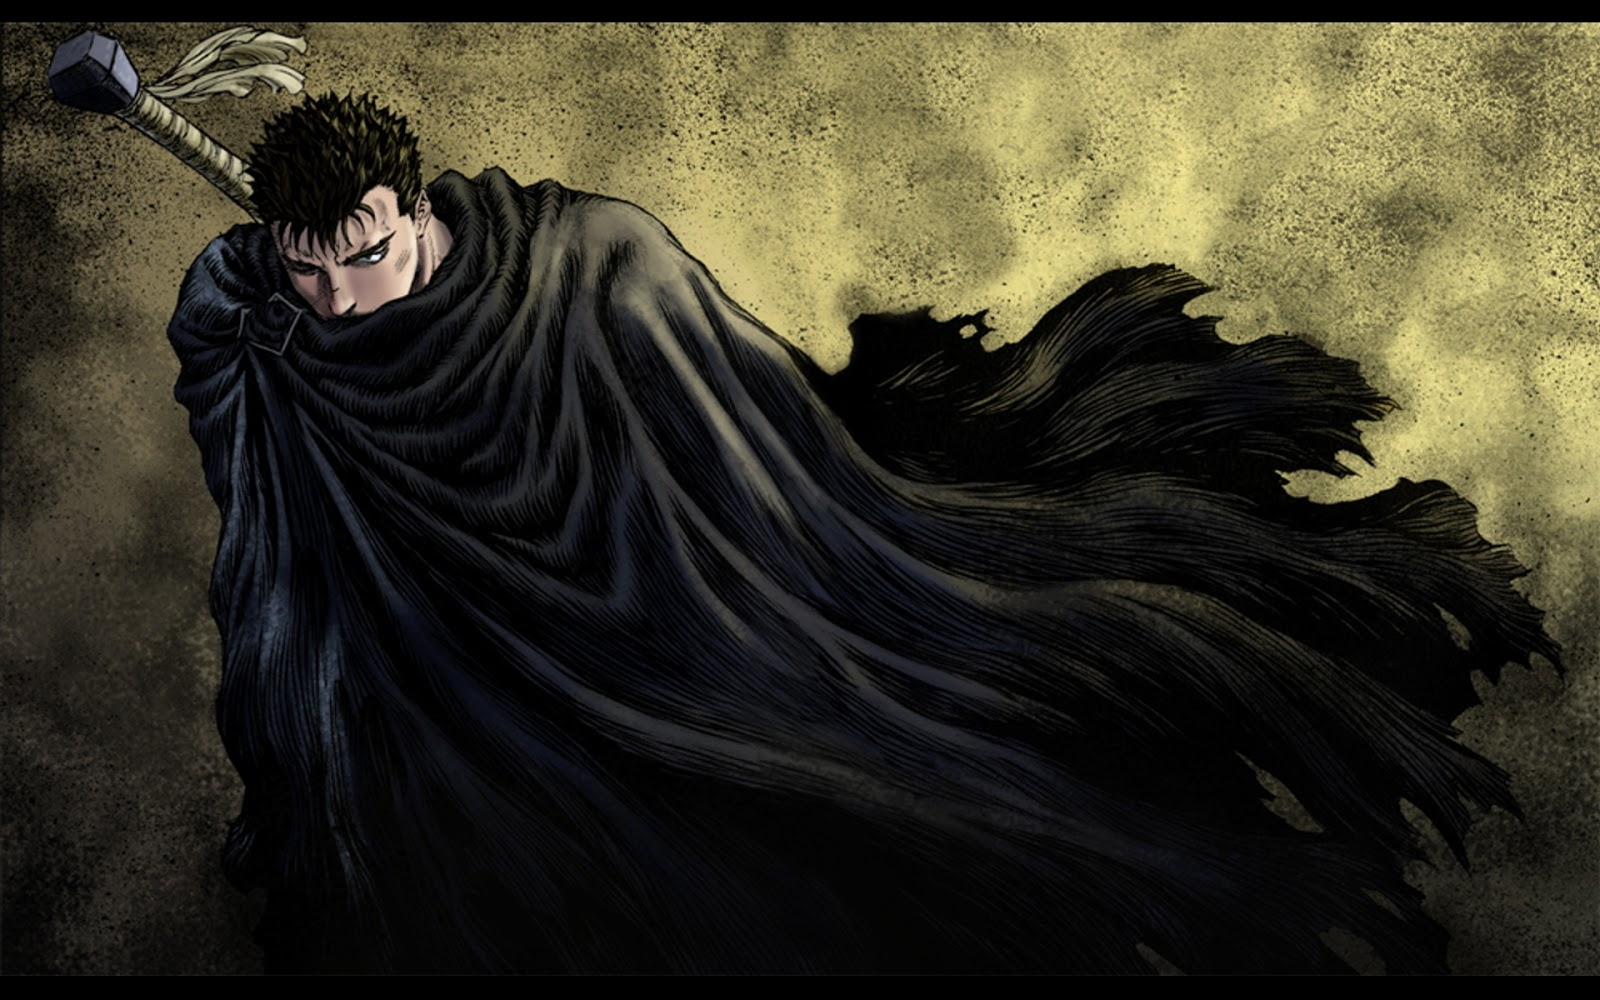 Anime Wallpapers: Berserk (Wallpaper)